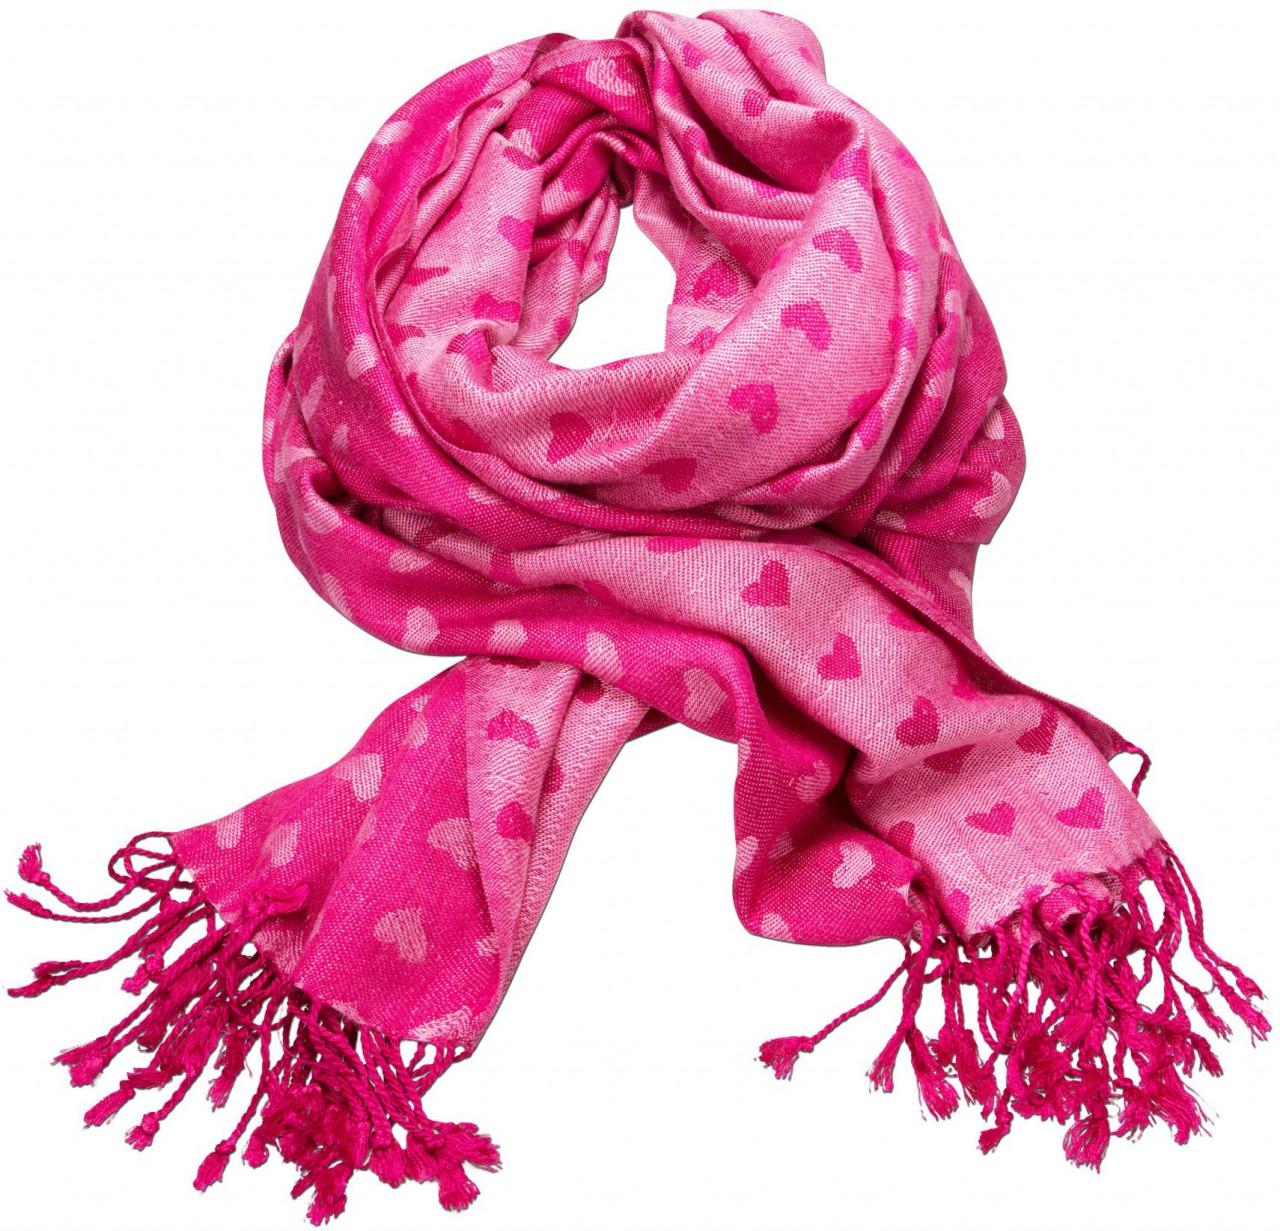 Trachtenschal Herzilein pink